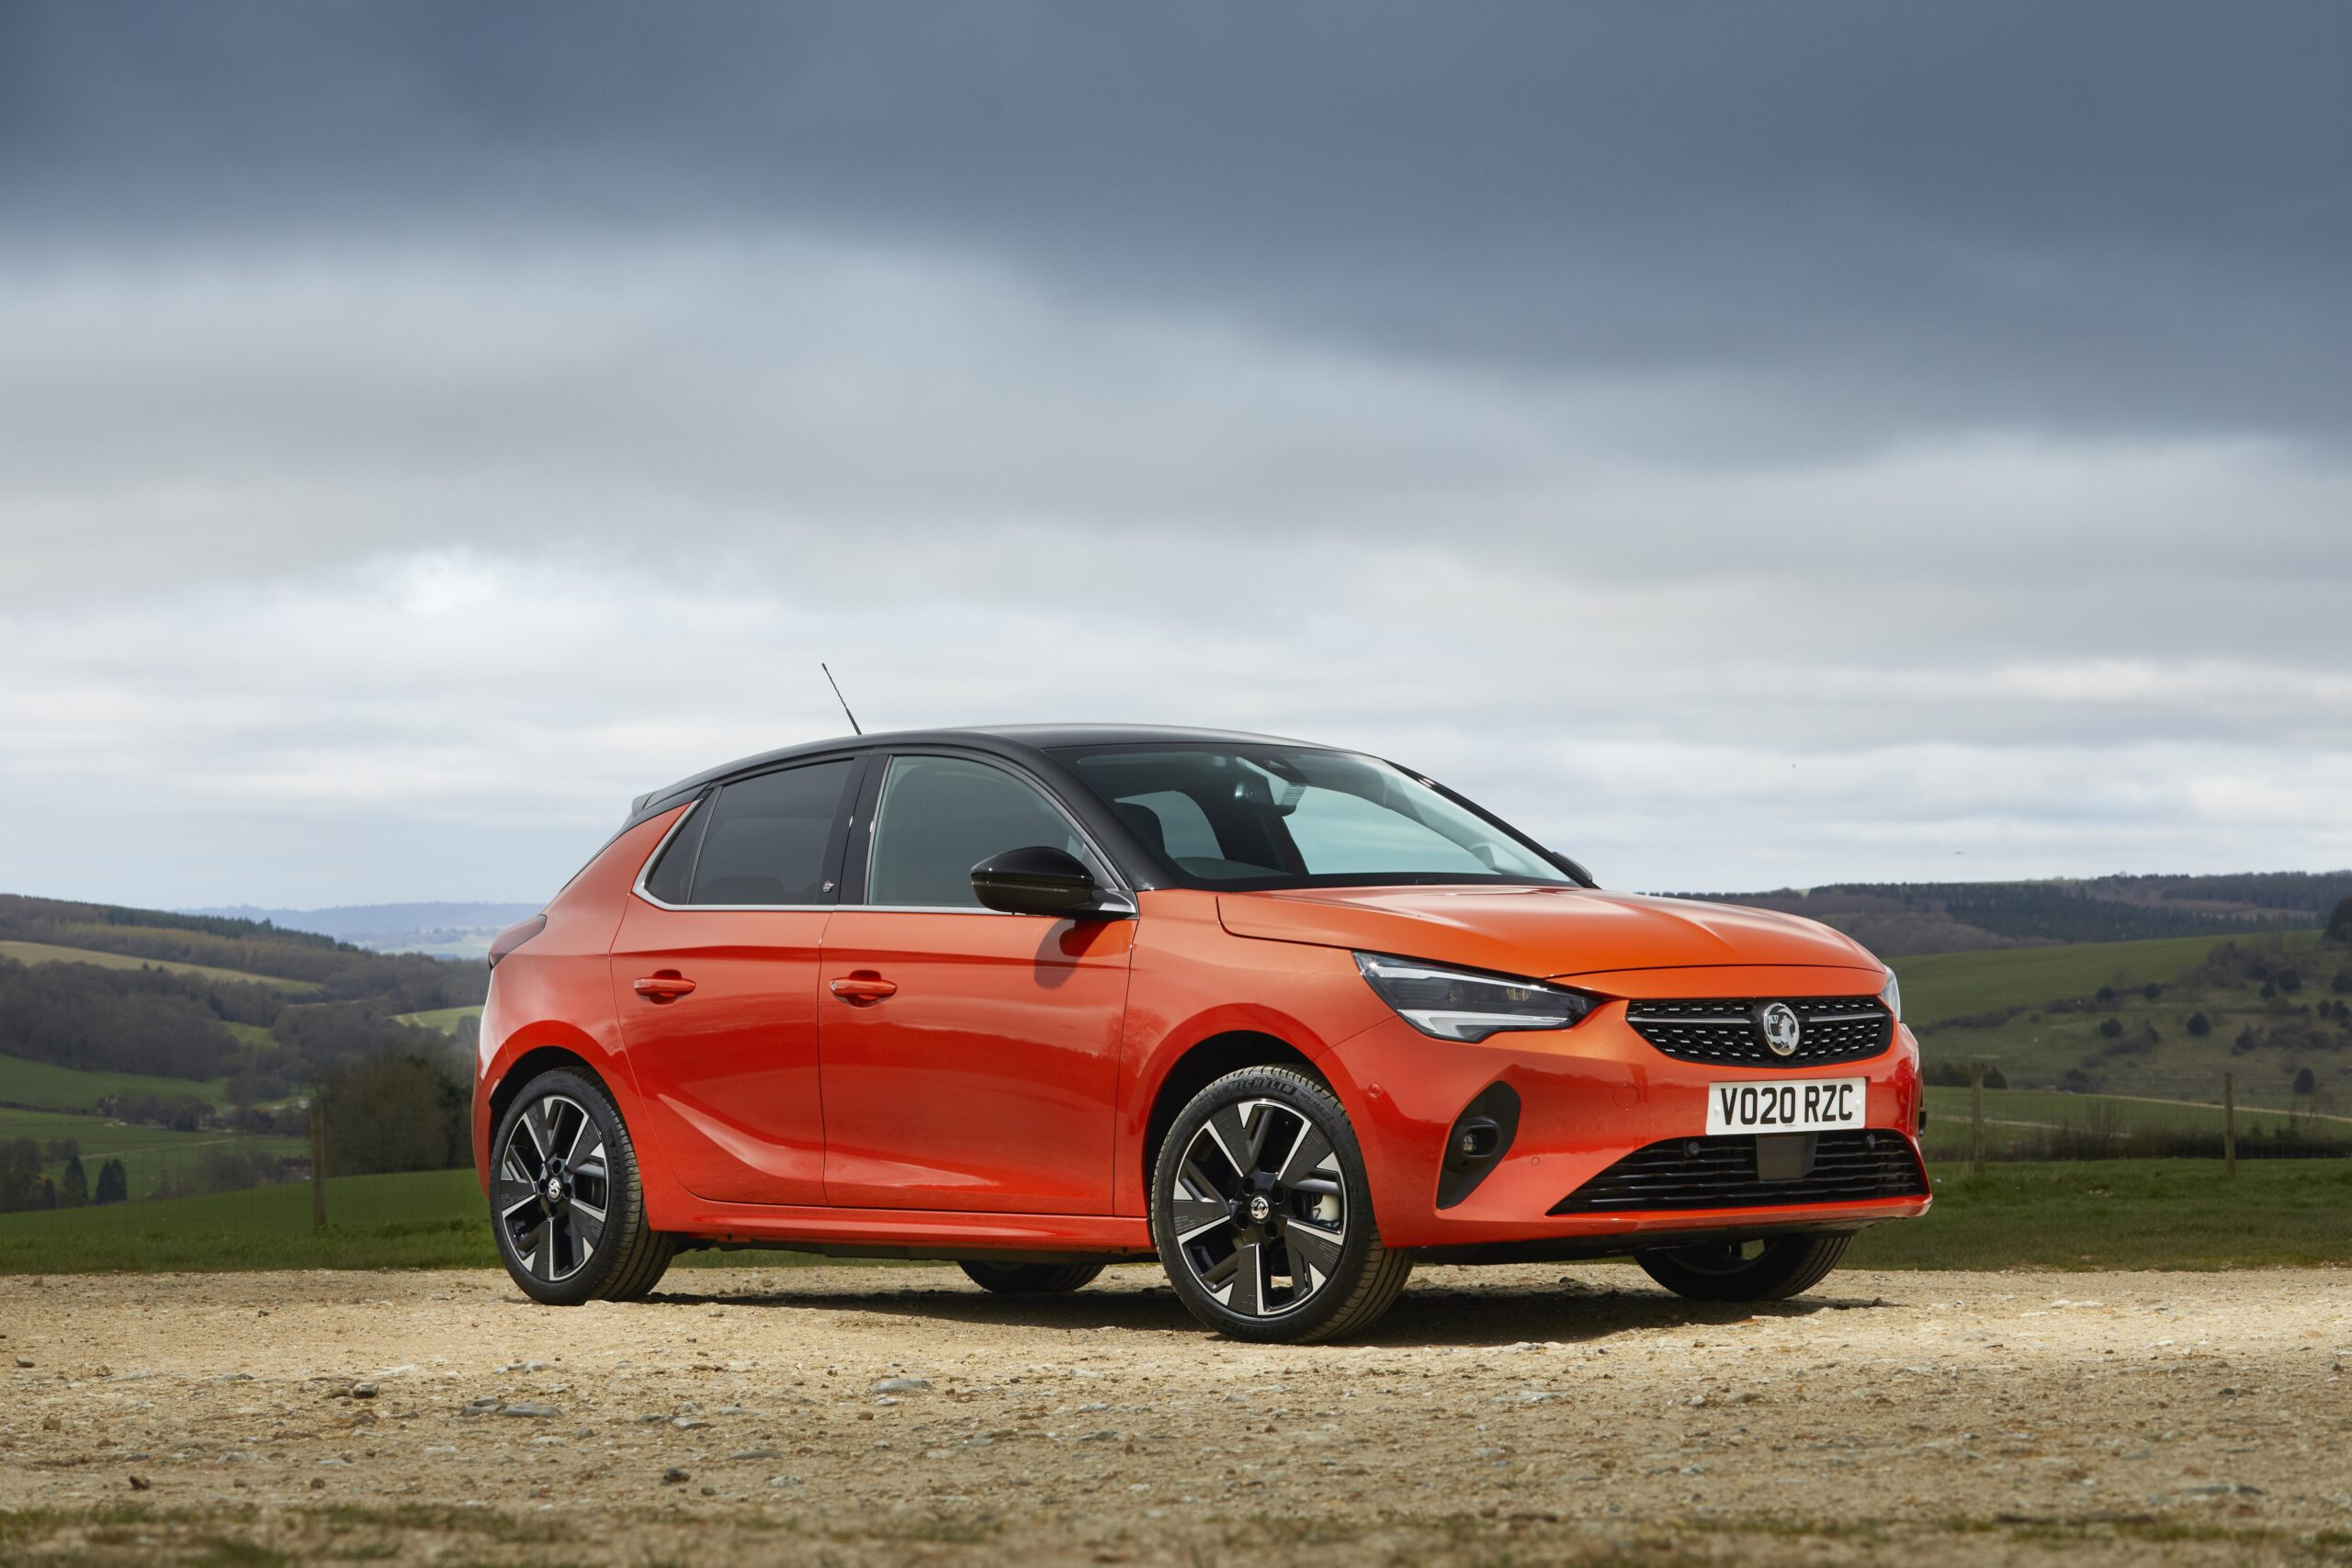 Vauxhall Opel Corsa-e